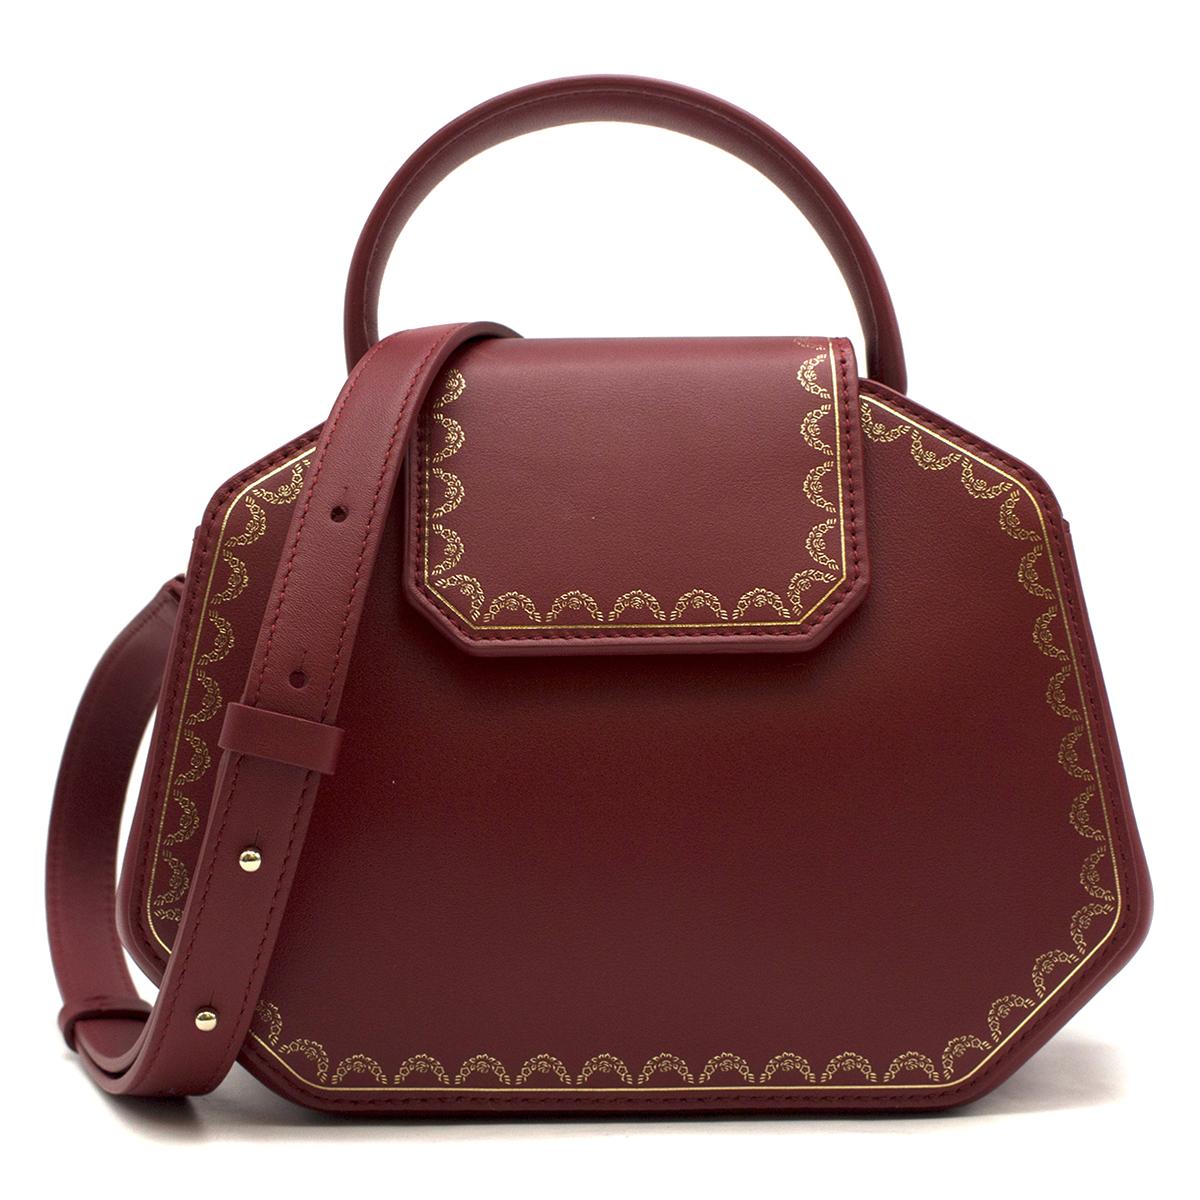 Cartier Mini Guirlande de Cartier Bag - New Season